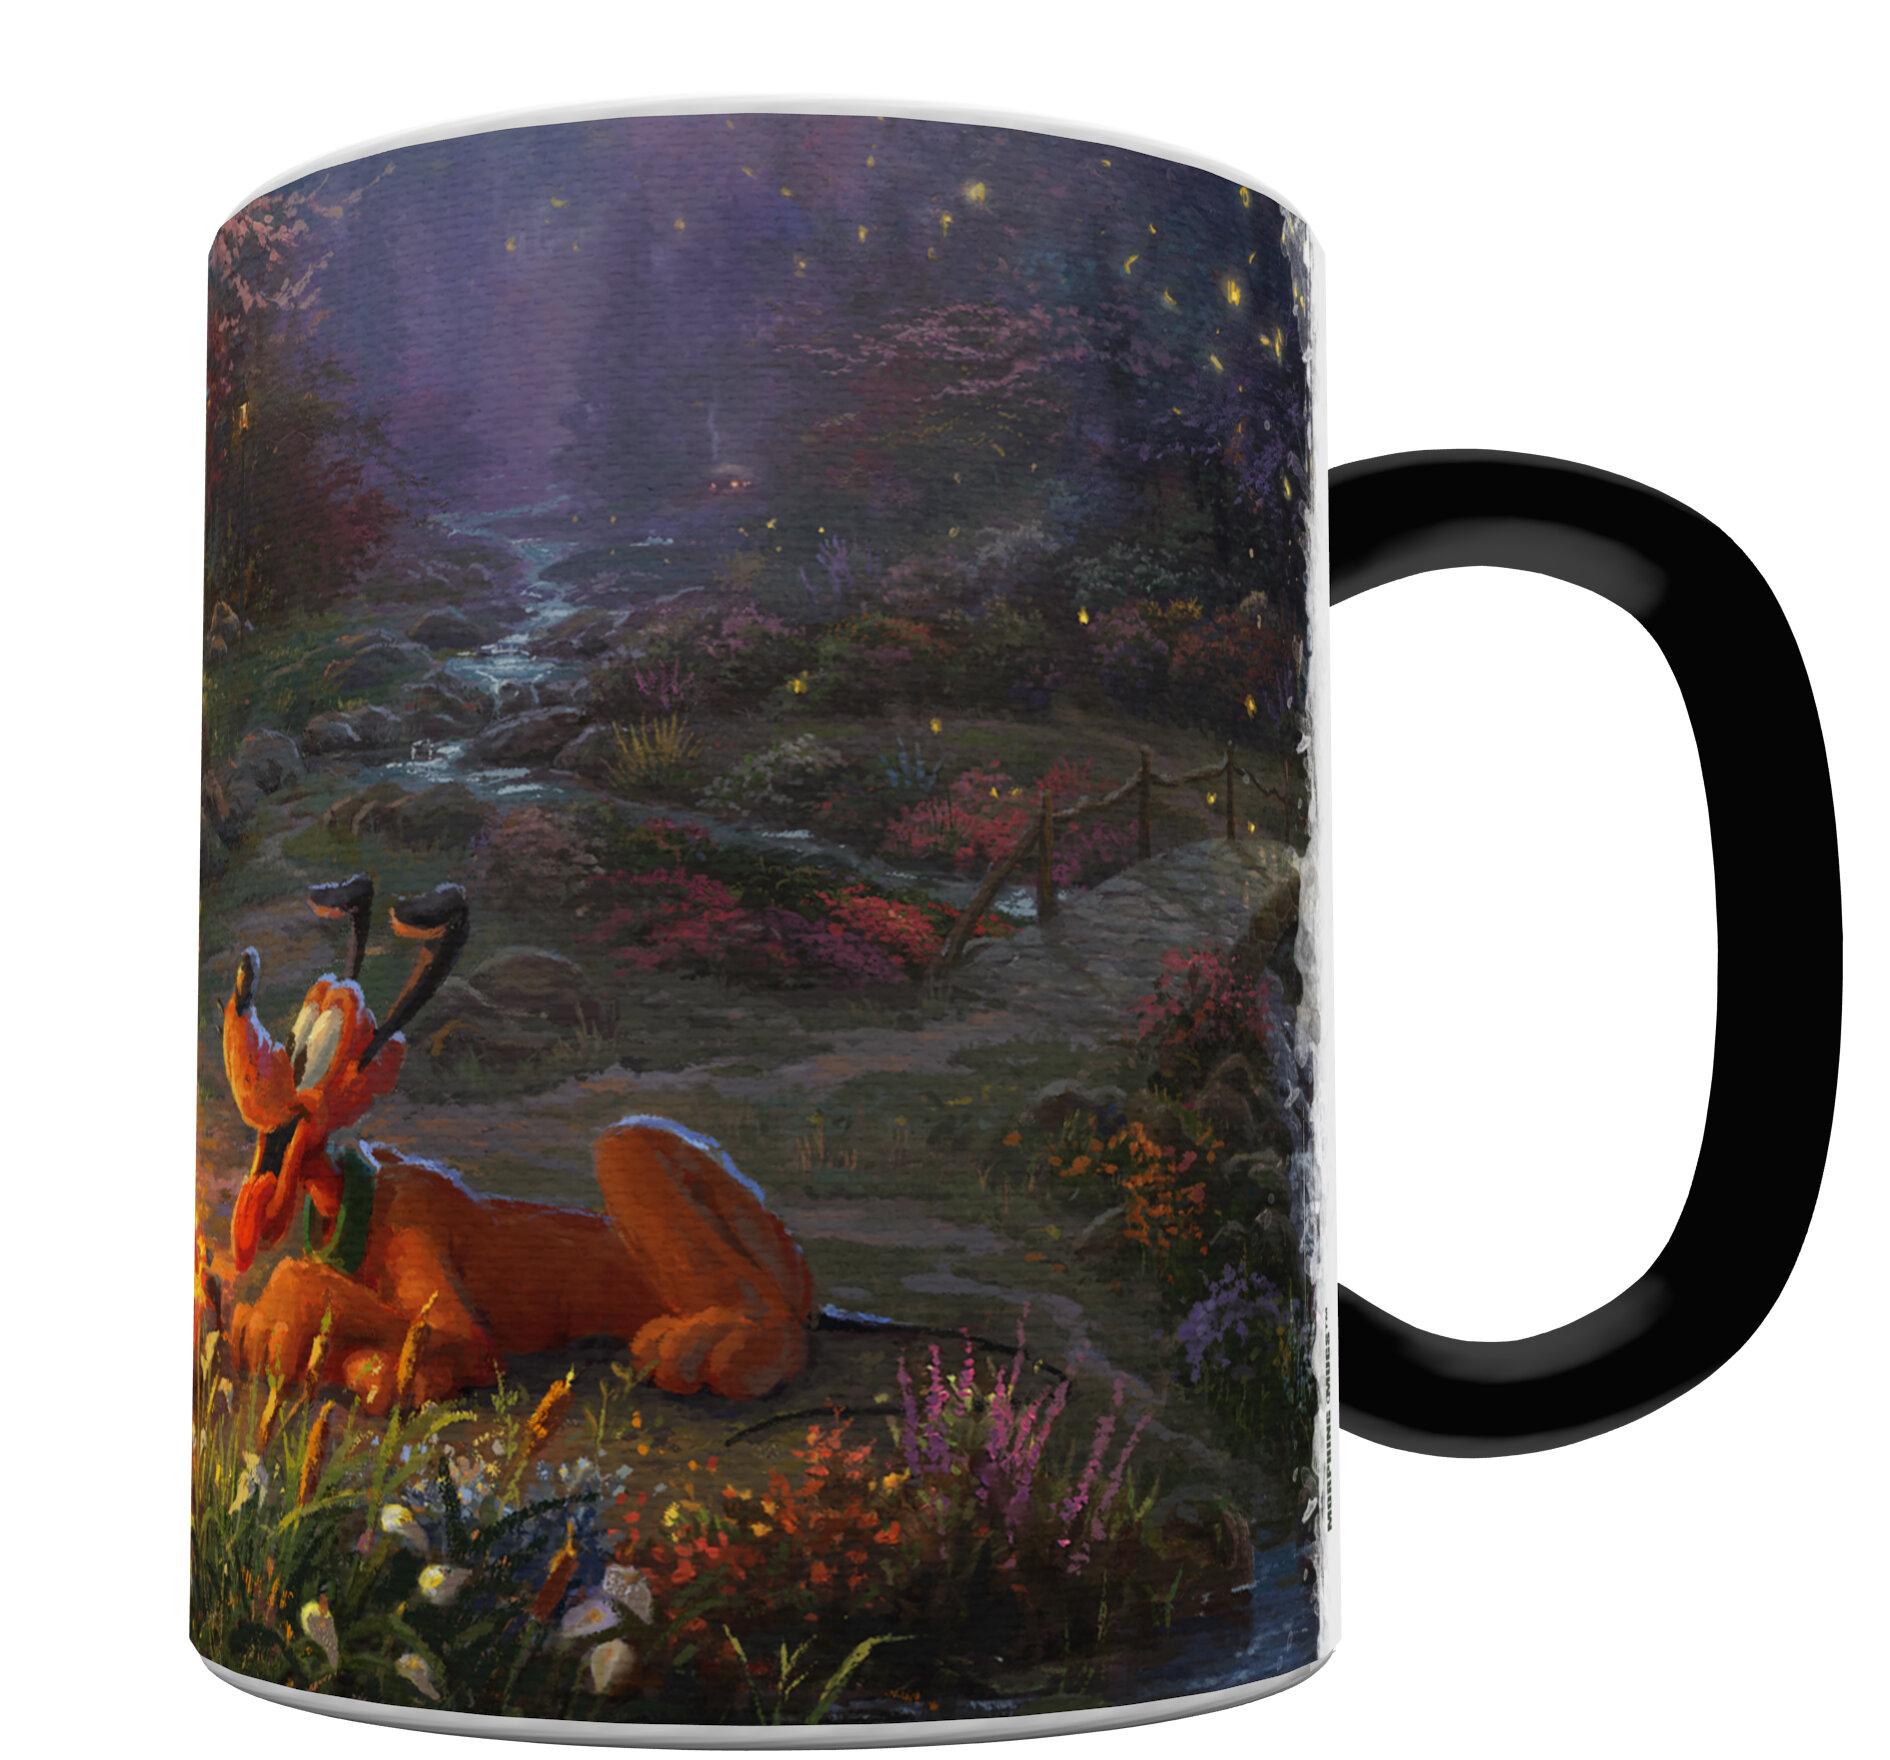 Morphing Mugs Disney Mickey And Minnie Mouse Campfire Thomas Kinkade Heat Sensitive Color Changing Heat Reveal Coffee Mug Wayfair